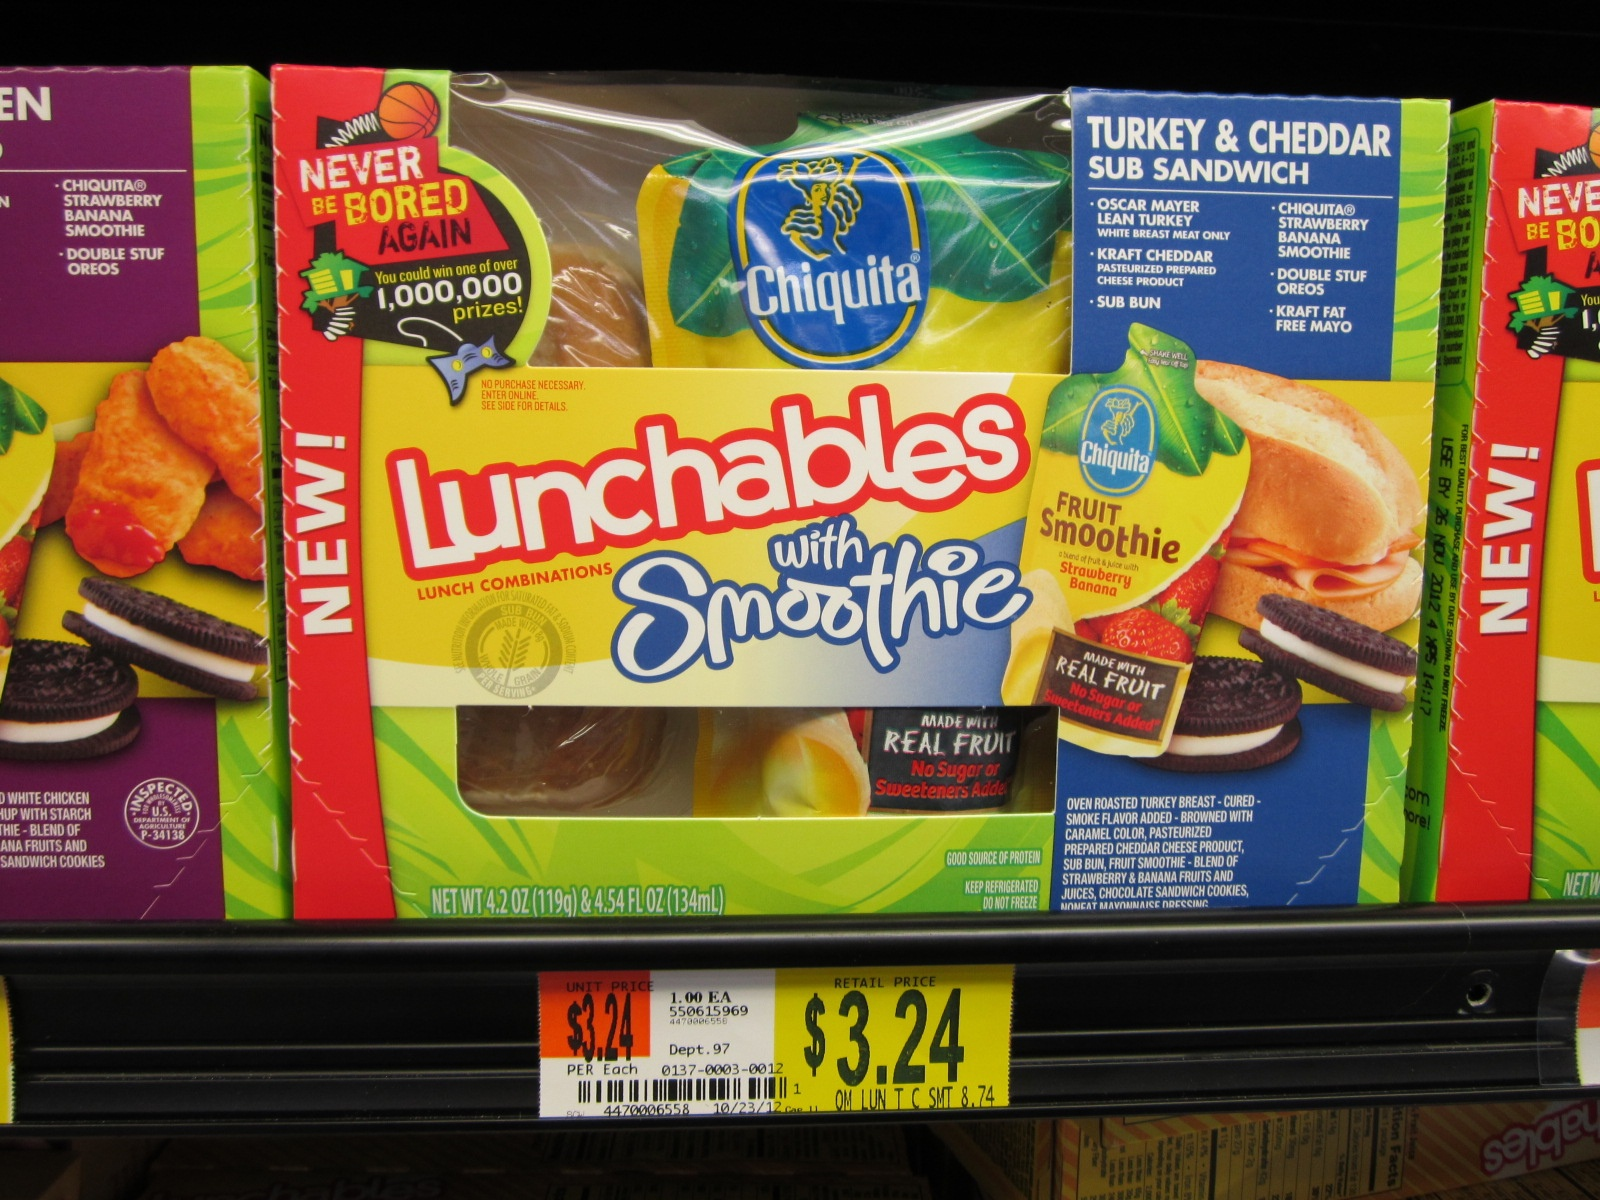 Lunchables Combinations Printable Coupon And Walmart Deal ~ Print It - Free Printable Food Coupons For Walmart